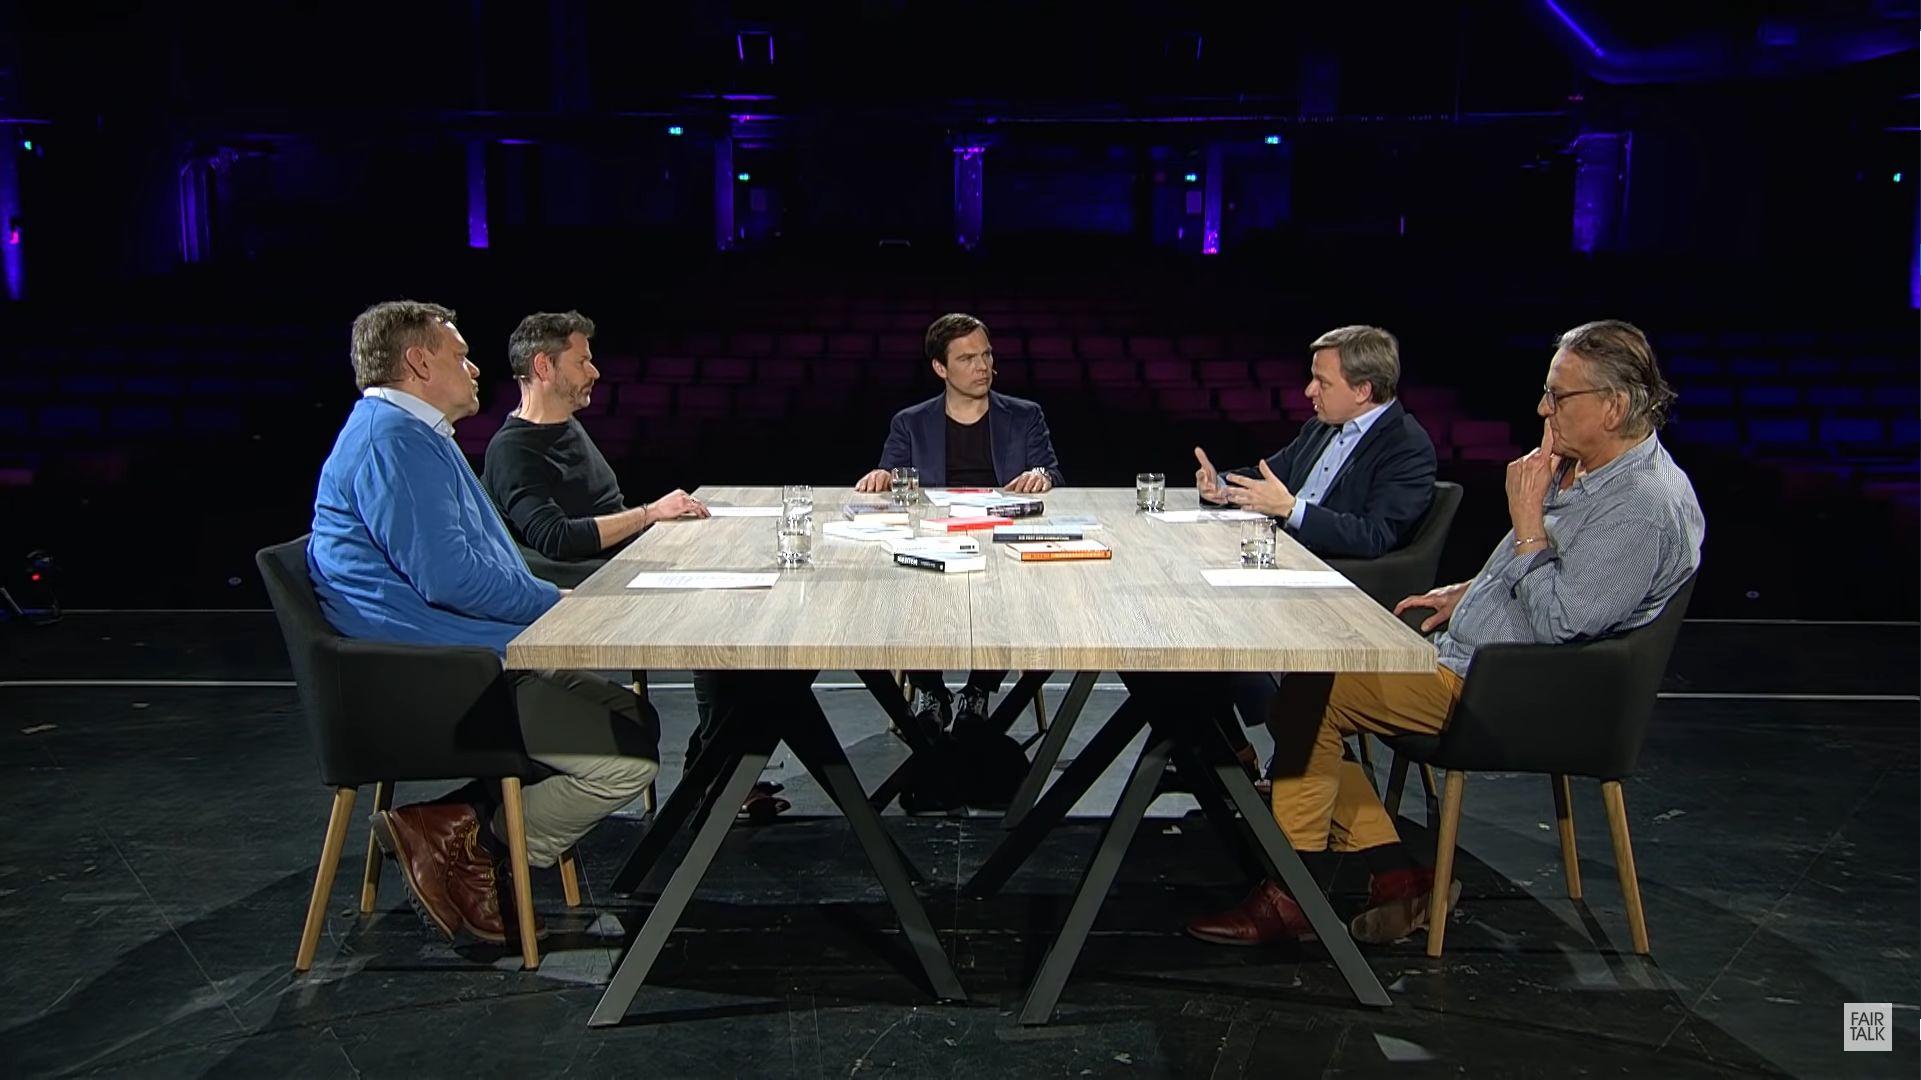 fair-talk-#16:-politik-–-schicksal-–-reset?-mit-dirk-pohlmann,-matthias-burchardt,-kai-ludders-u-walter-van-rossum-|-kenfm.de